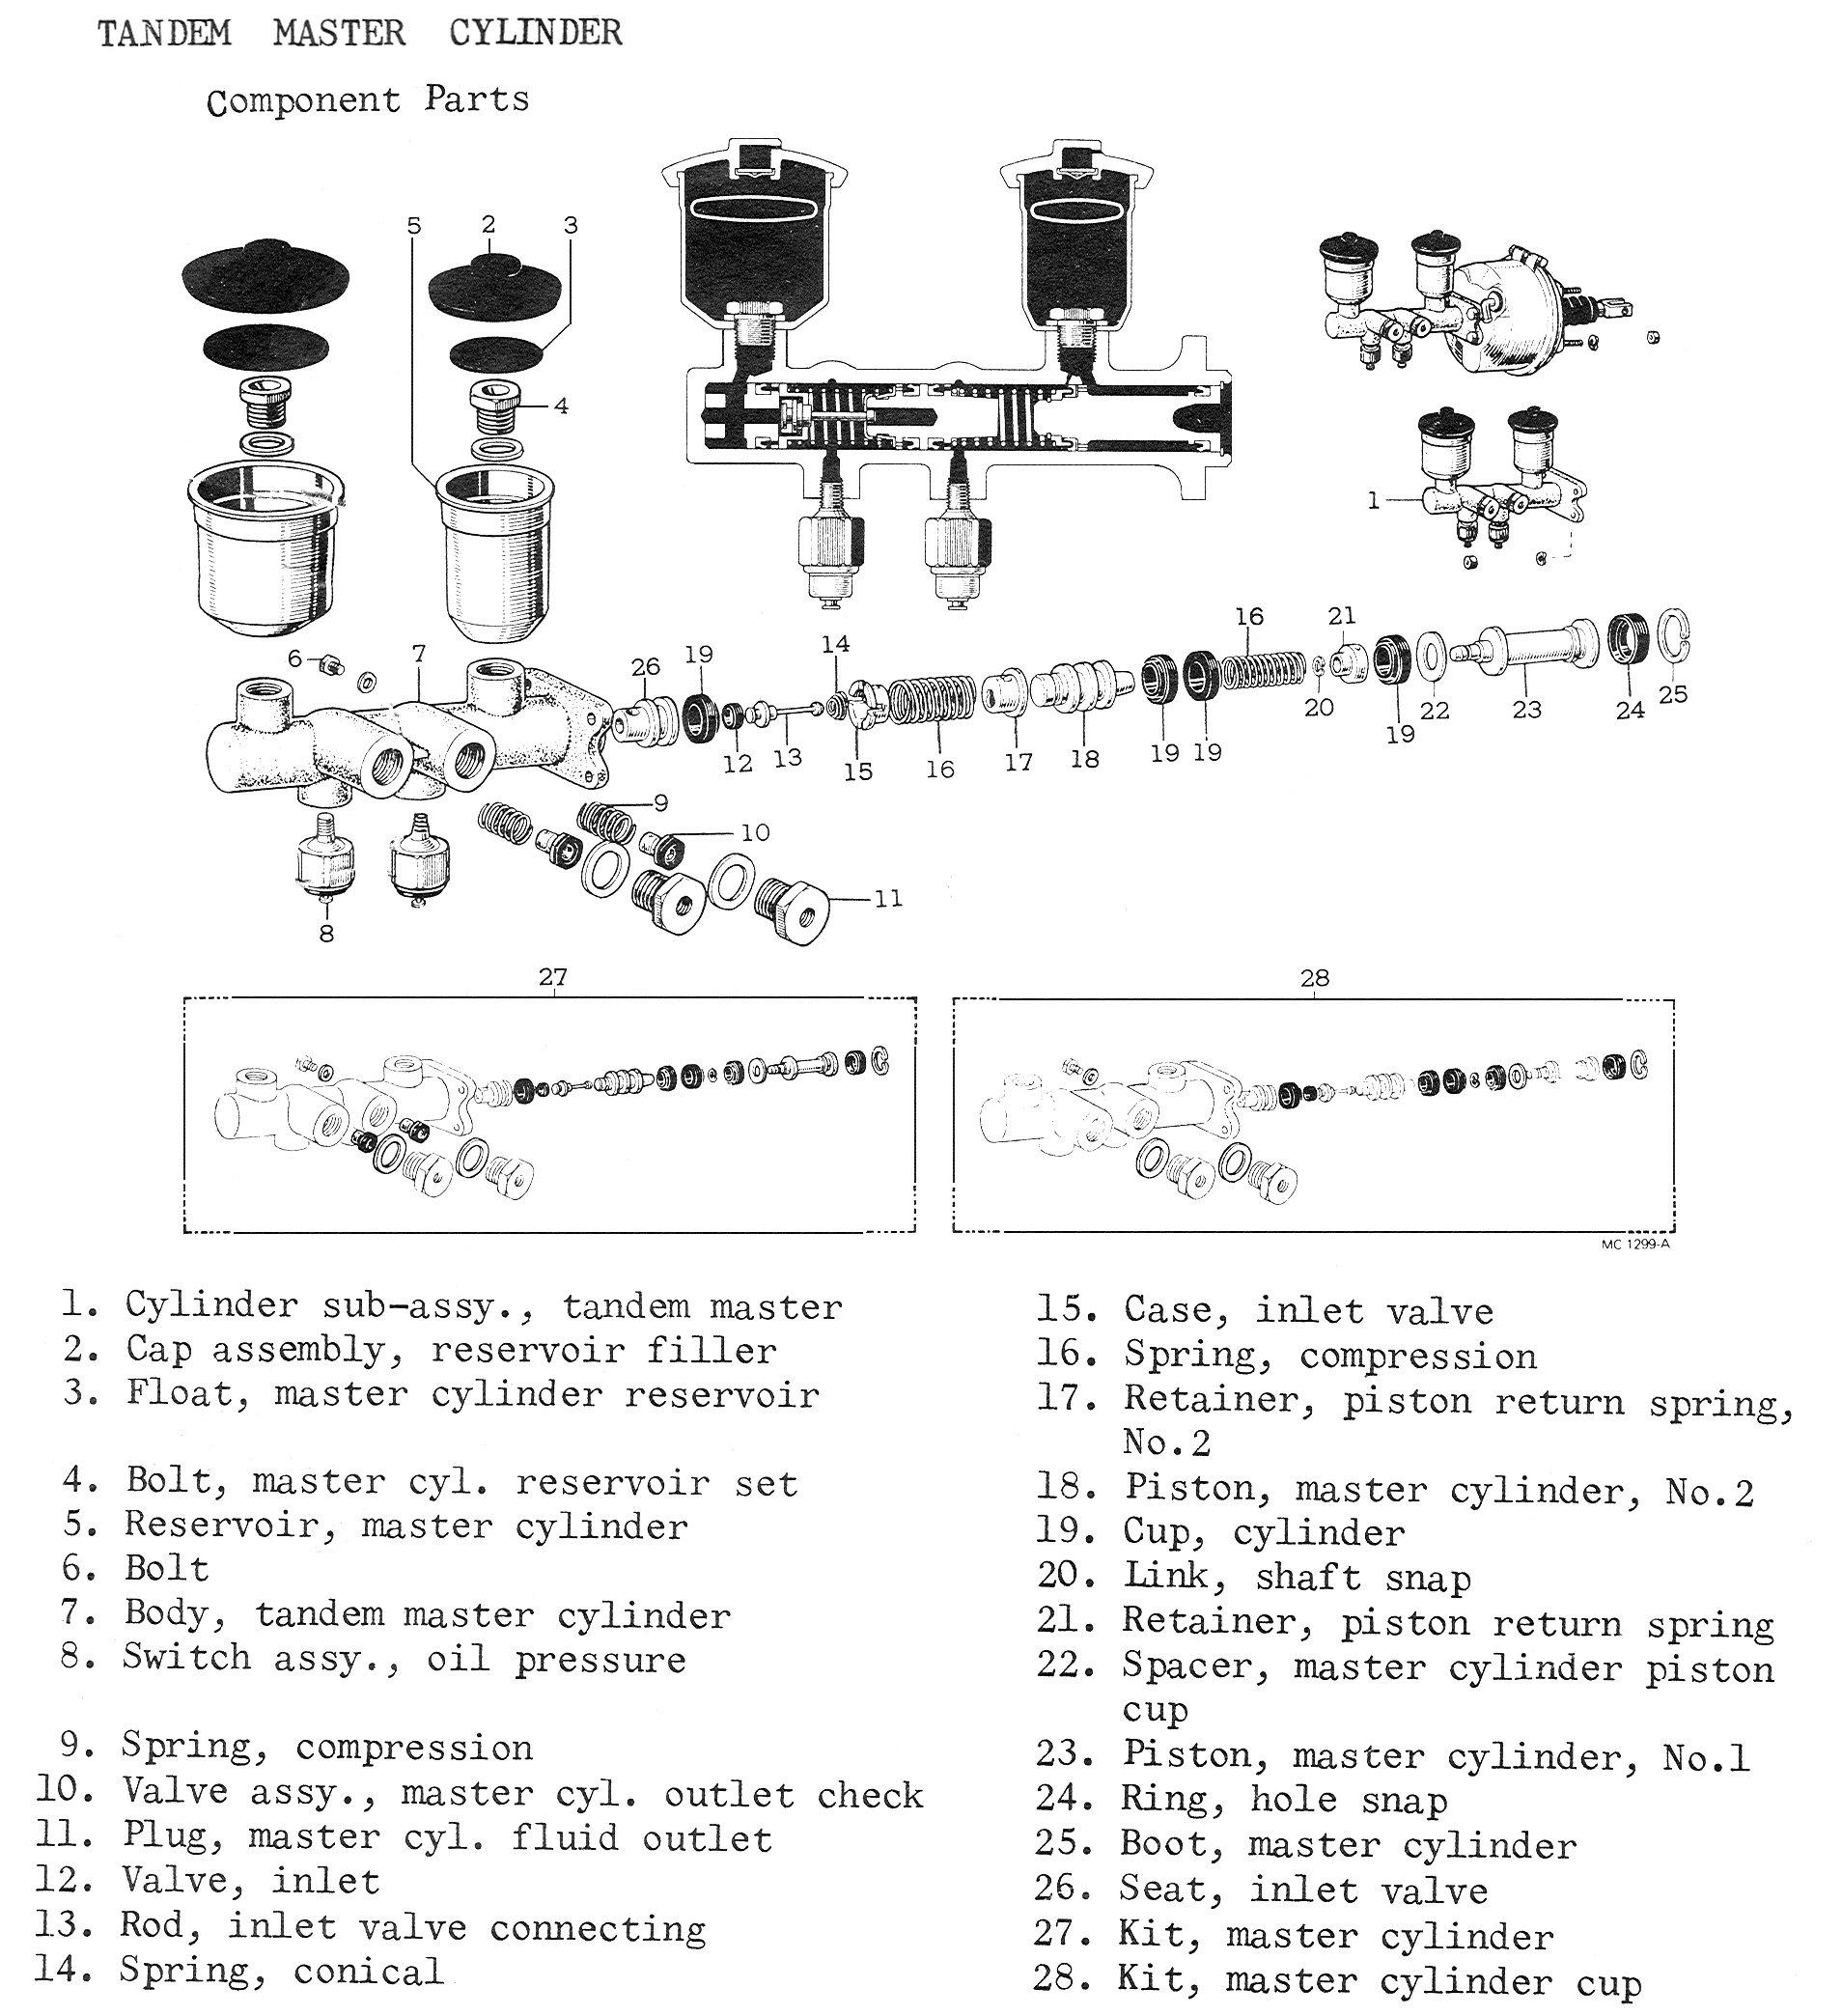 211BRAKES7 37 master cylinder rebuild master cylinder diagram at bayanpartner.co